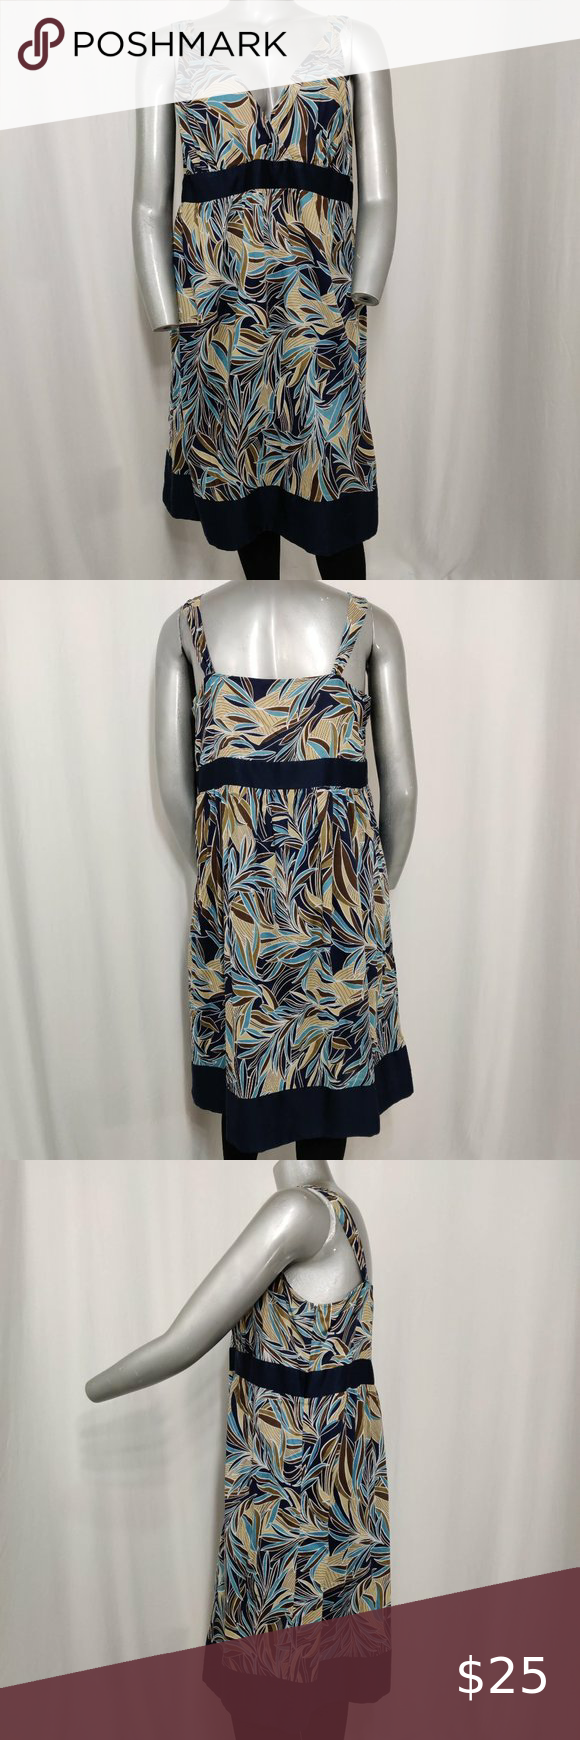 Avenue Cotton Summer Dress Empire Vneck Print Xxl In 2020 Cotton Dress Summer Empire Dress Summer Dresses [ 1740 x 580 Pixel ]